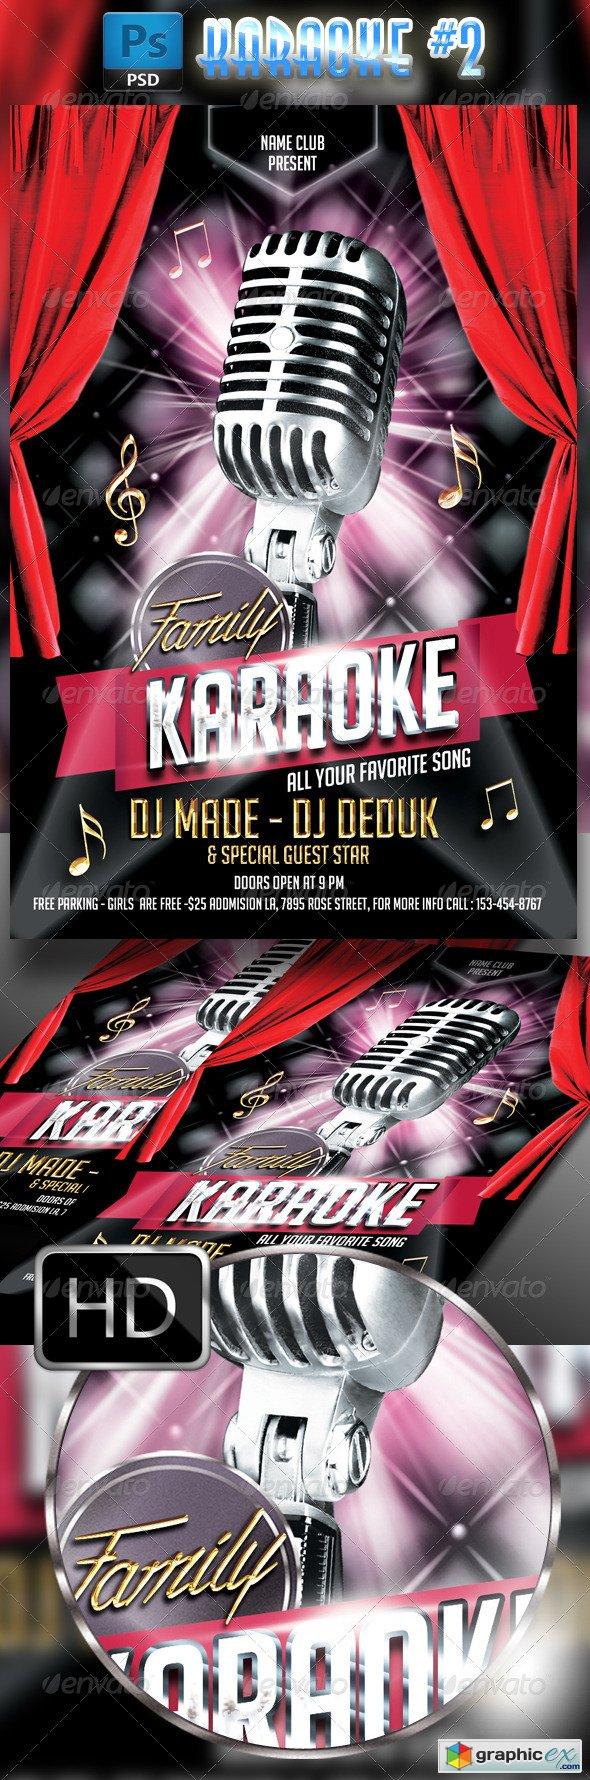 Karaoke Flyer Template 2 Free Download Vector Stock Image